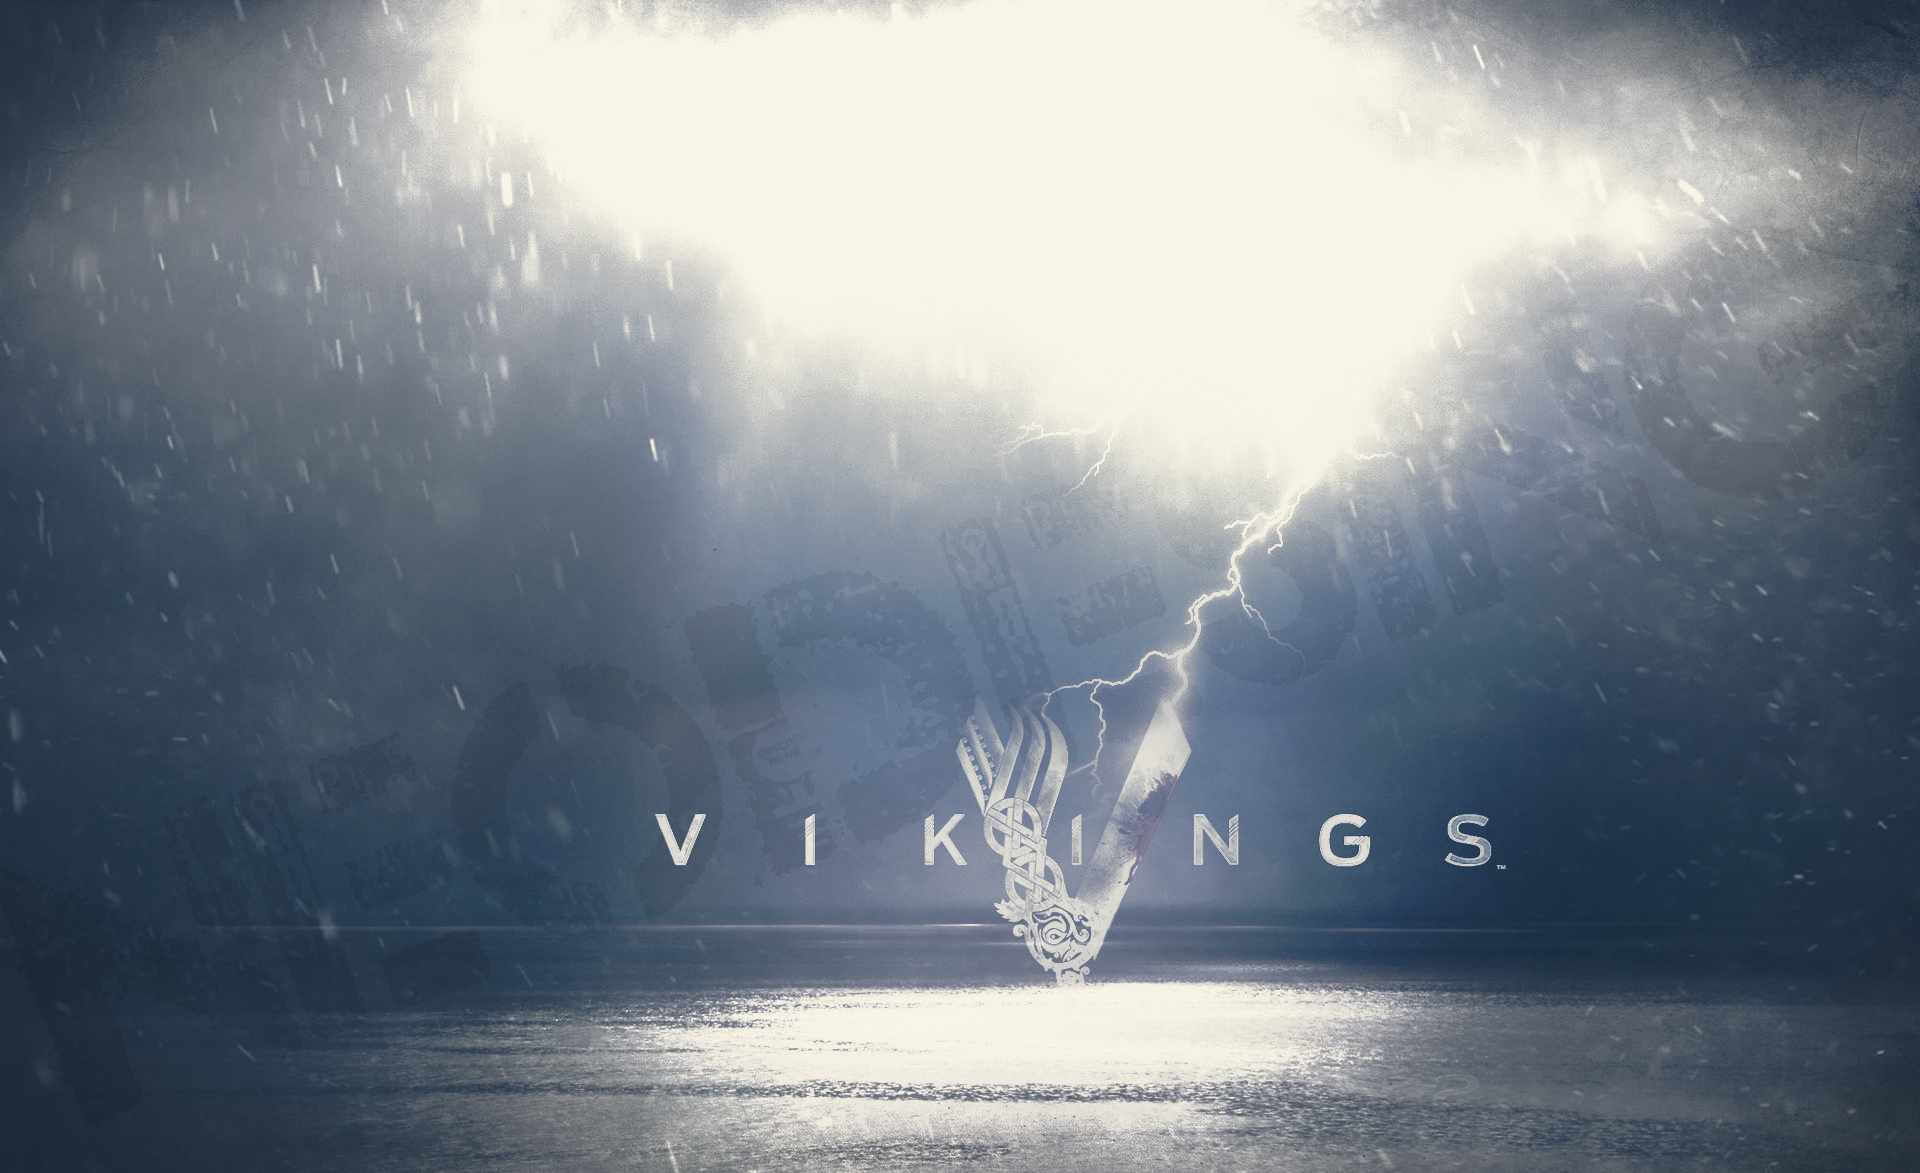 wallpaper viking wallpapers - photo #30